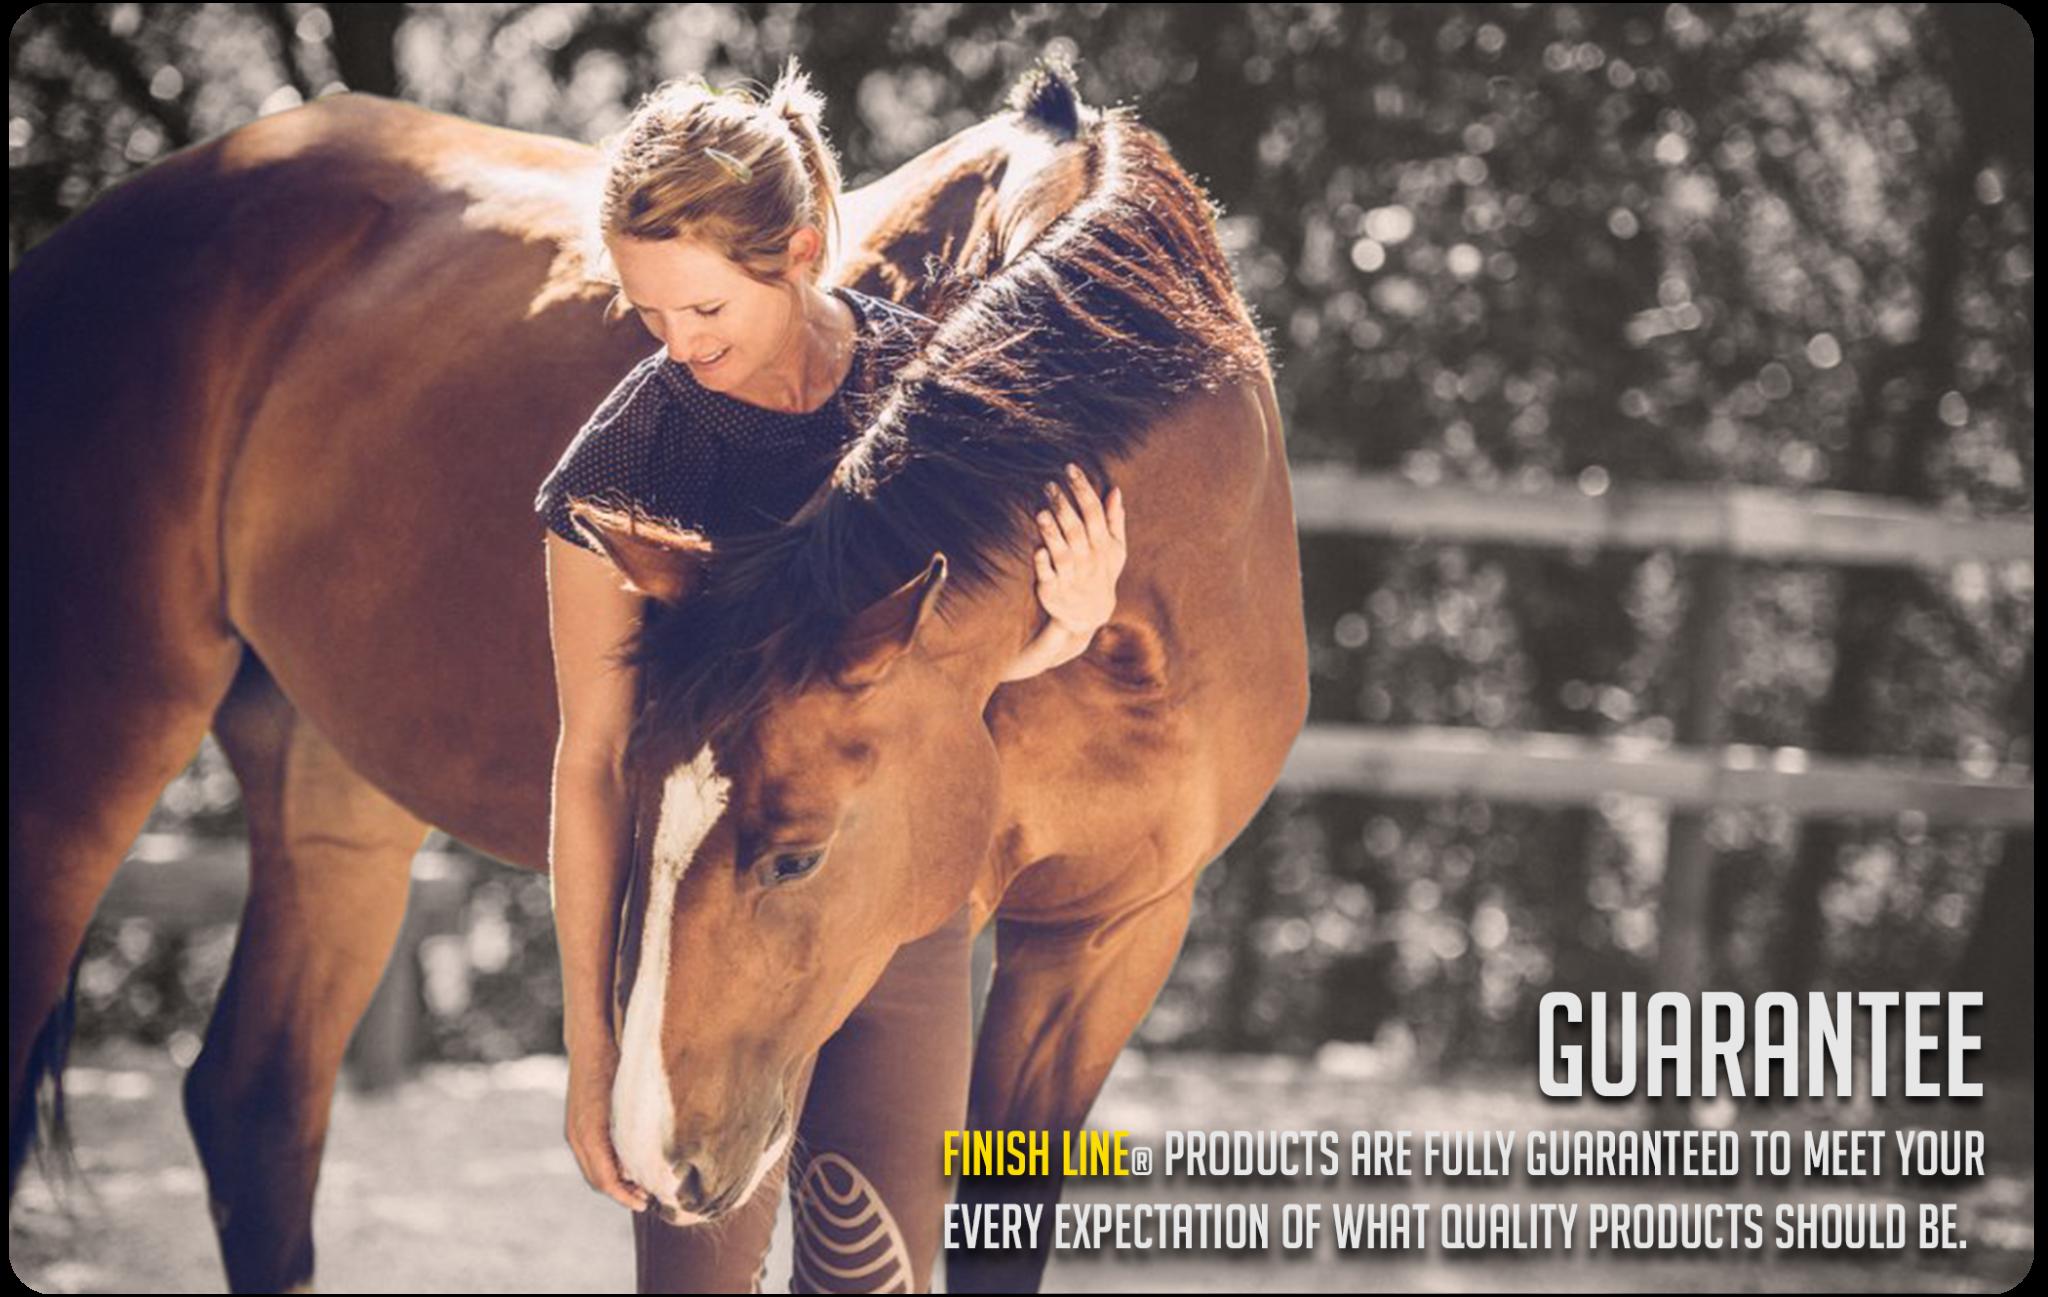 Finish line horse offers 100% money back guarantee